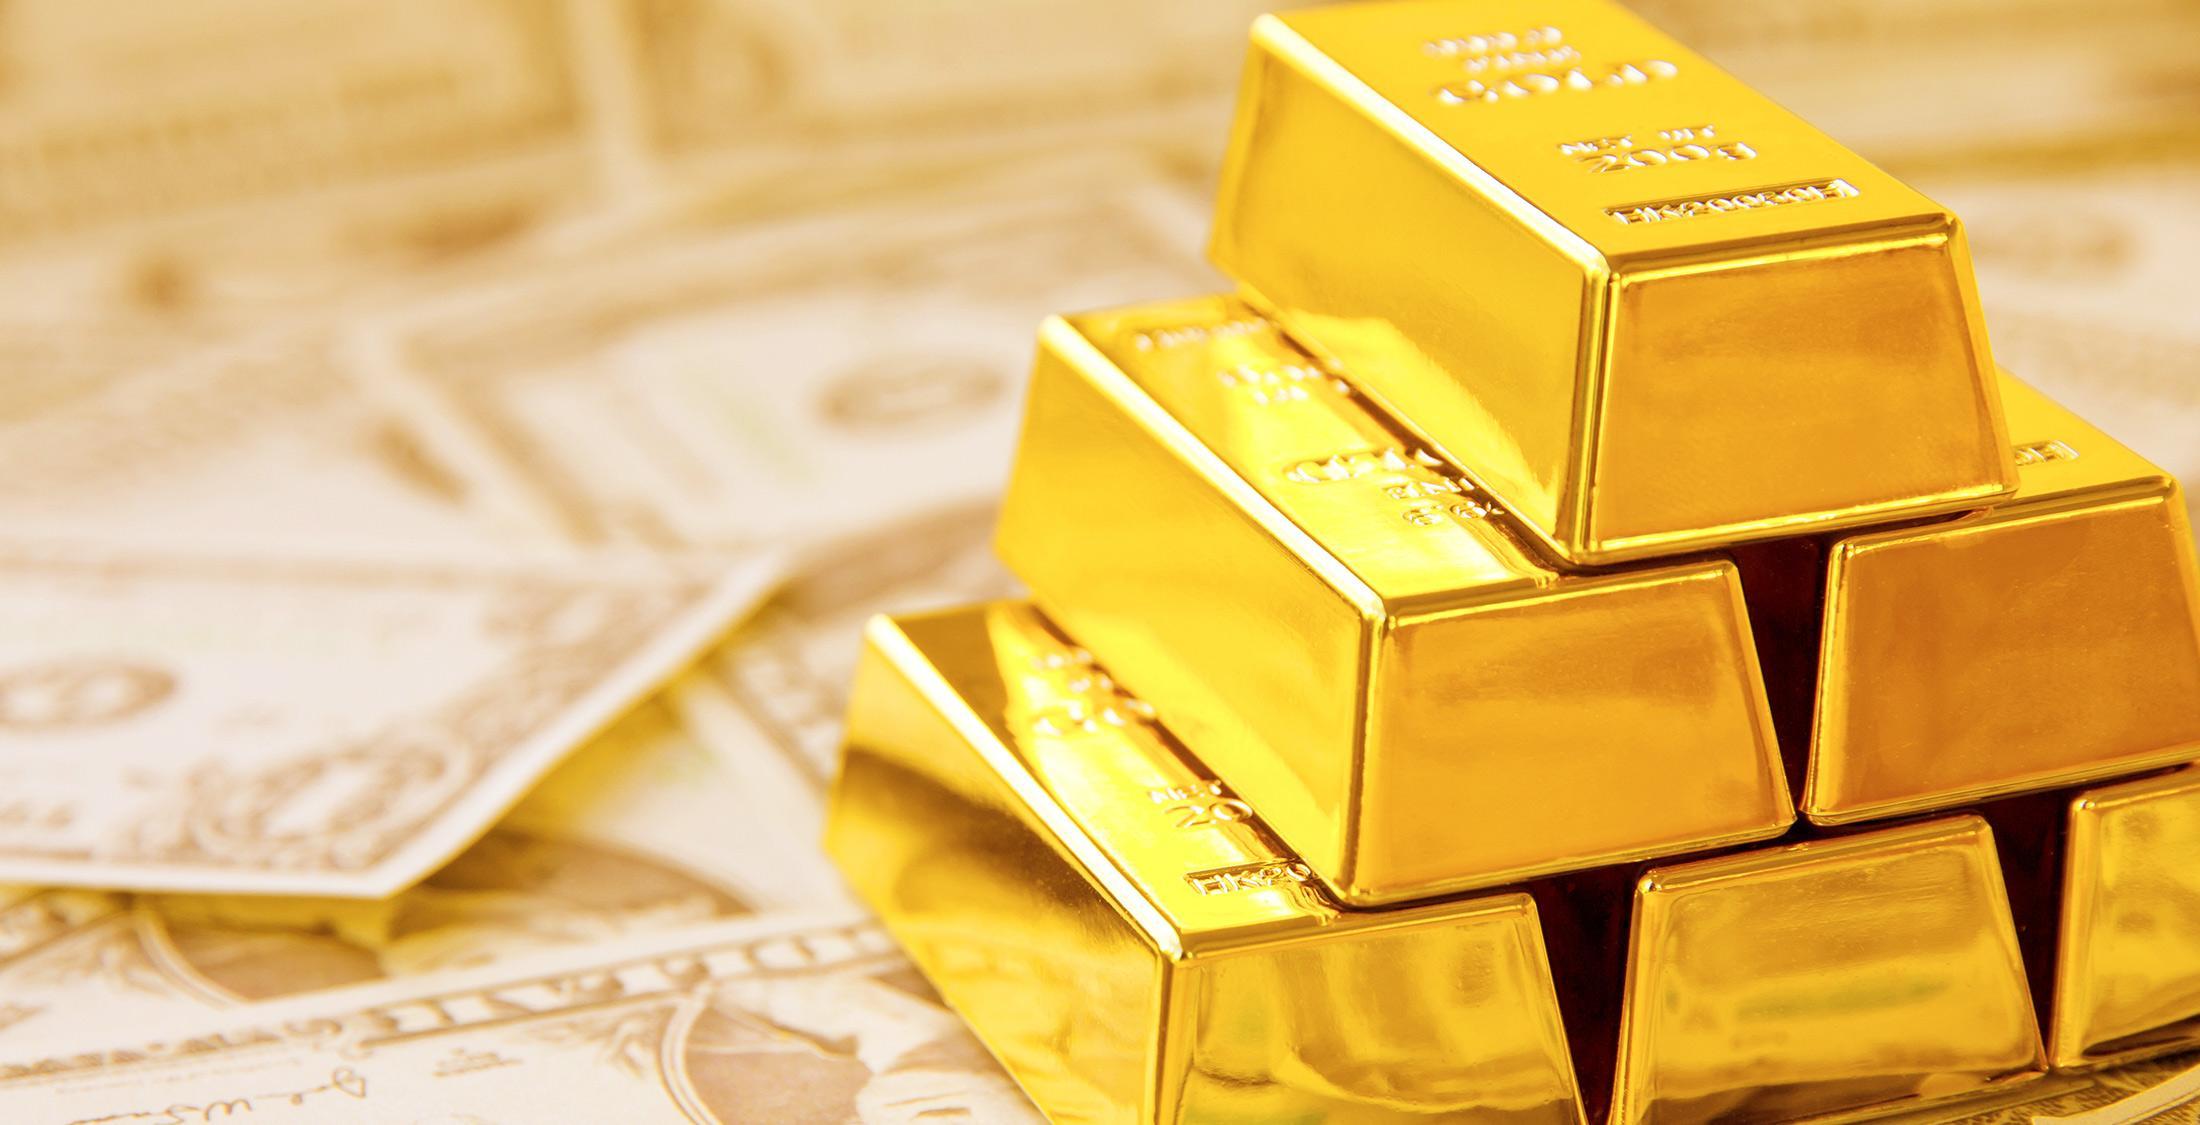 gold bars atop dollar bills